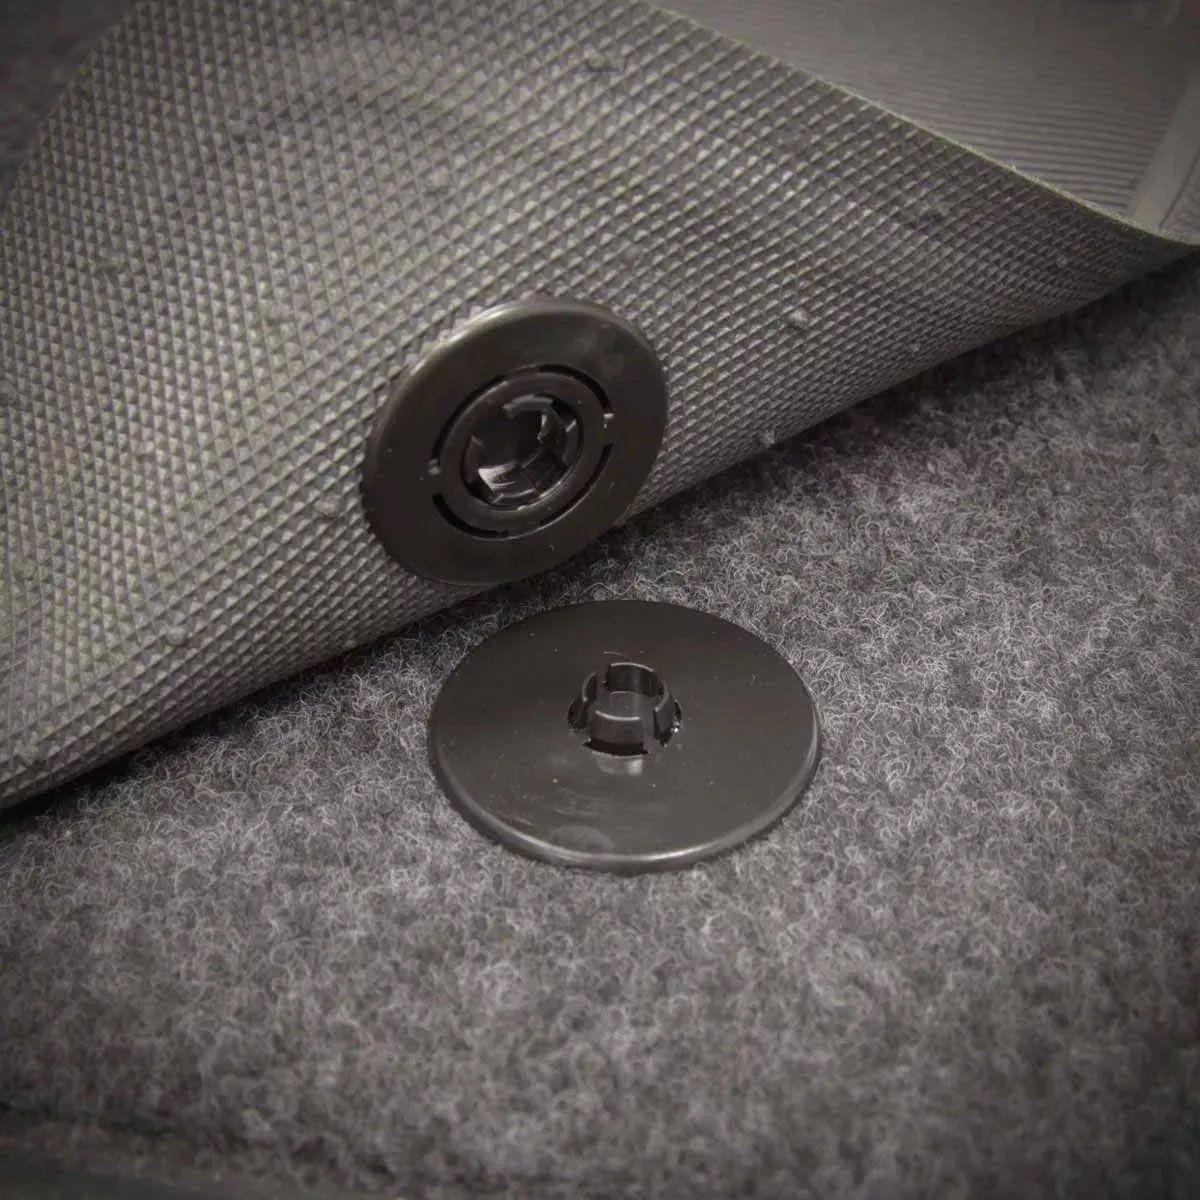 Jogo de Tapete Carpete Uno Automotivo Bordado Fiat Logo Azul Preto Personalizado